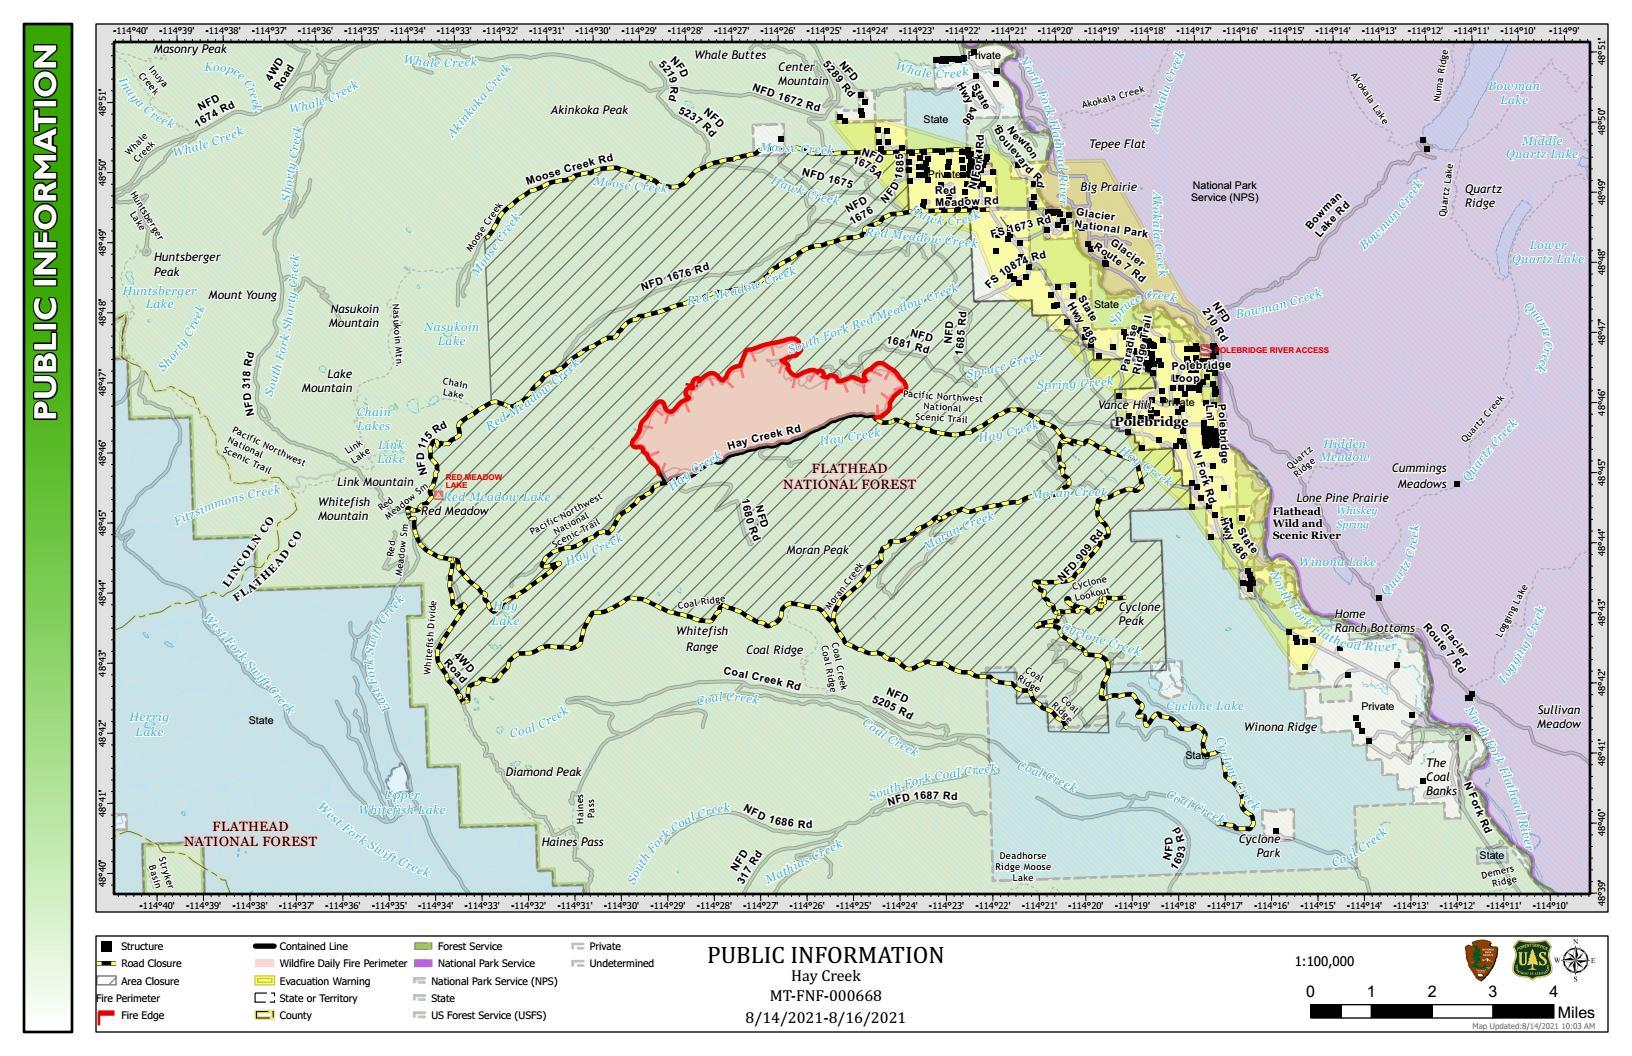 Hay Creek Fire Public Info Map for August 14-16, 2021